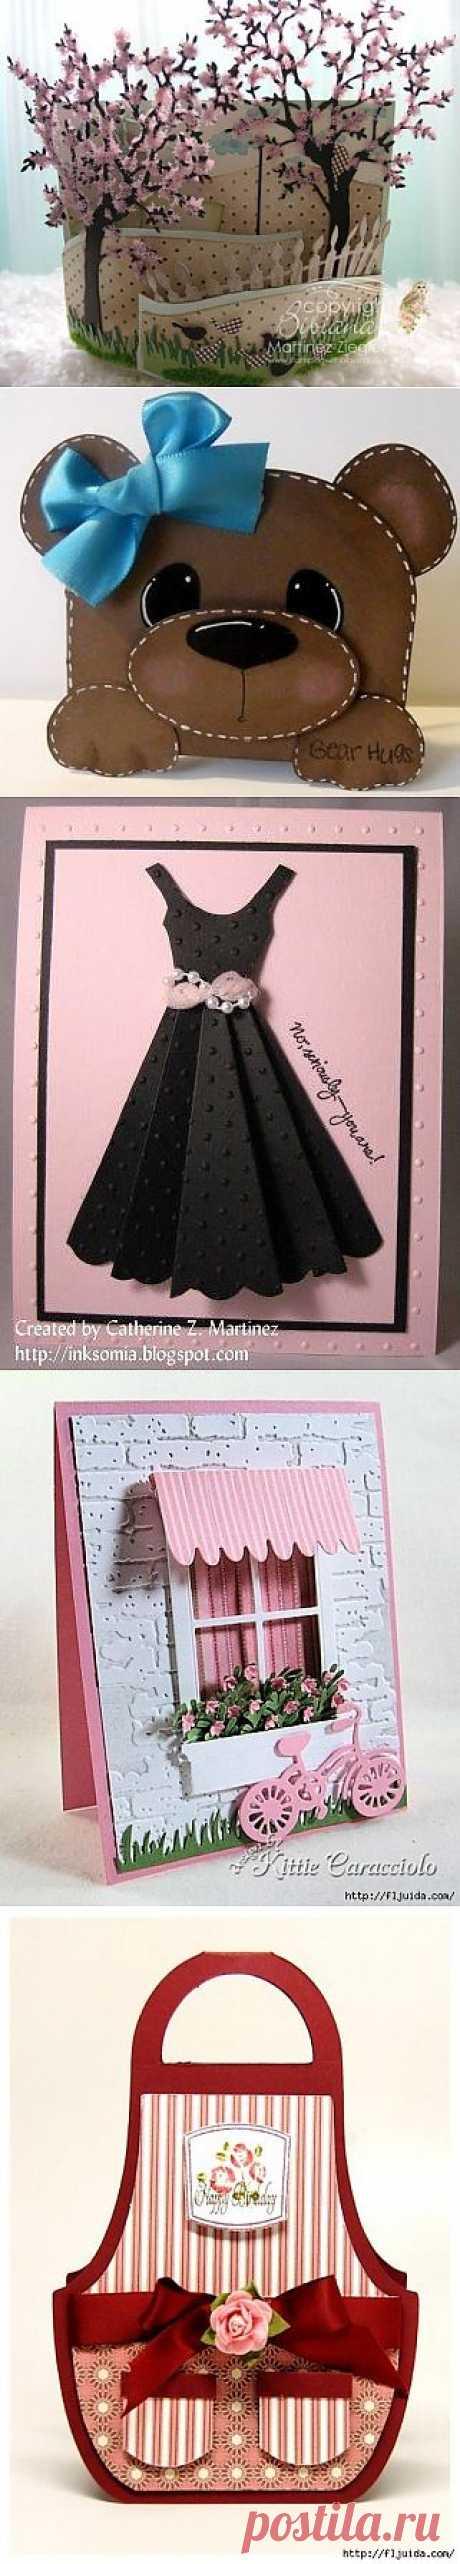 Идеи оформления открыток, мастер-класс / Бумага и карандаши (скрапбукинг, оригами, и т.д.) /